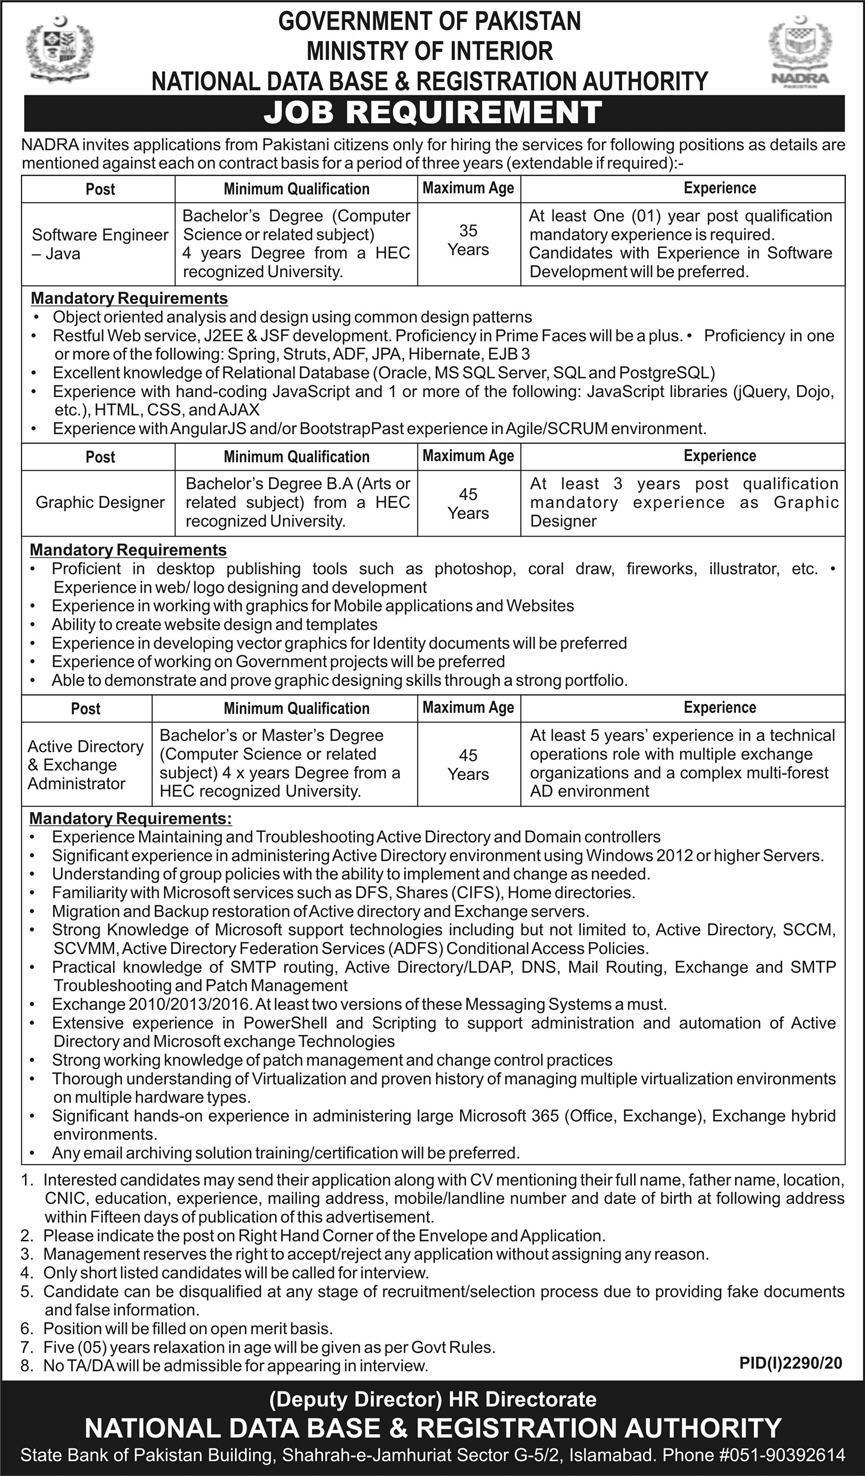 NADRA Latest Jobs National Database & Registration Authority Jobs in Pakistan Jobs 2021